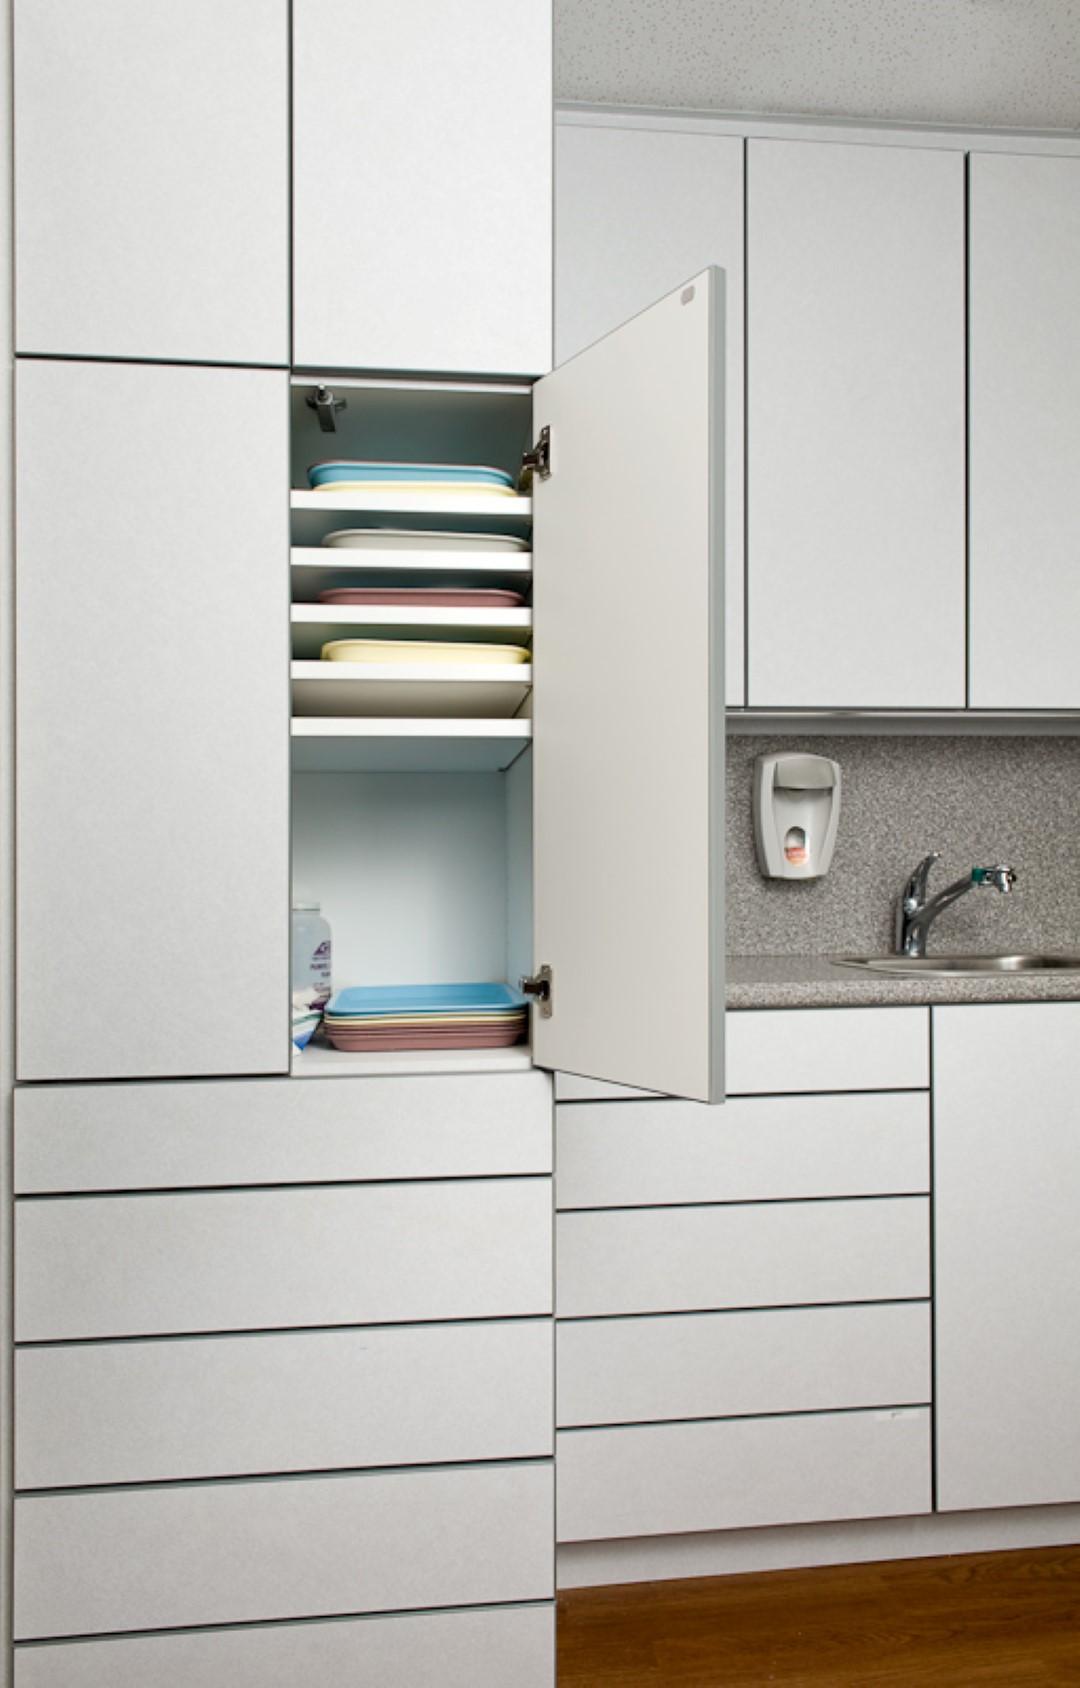 Cabinets-1004 (Large).jpg